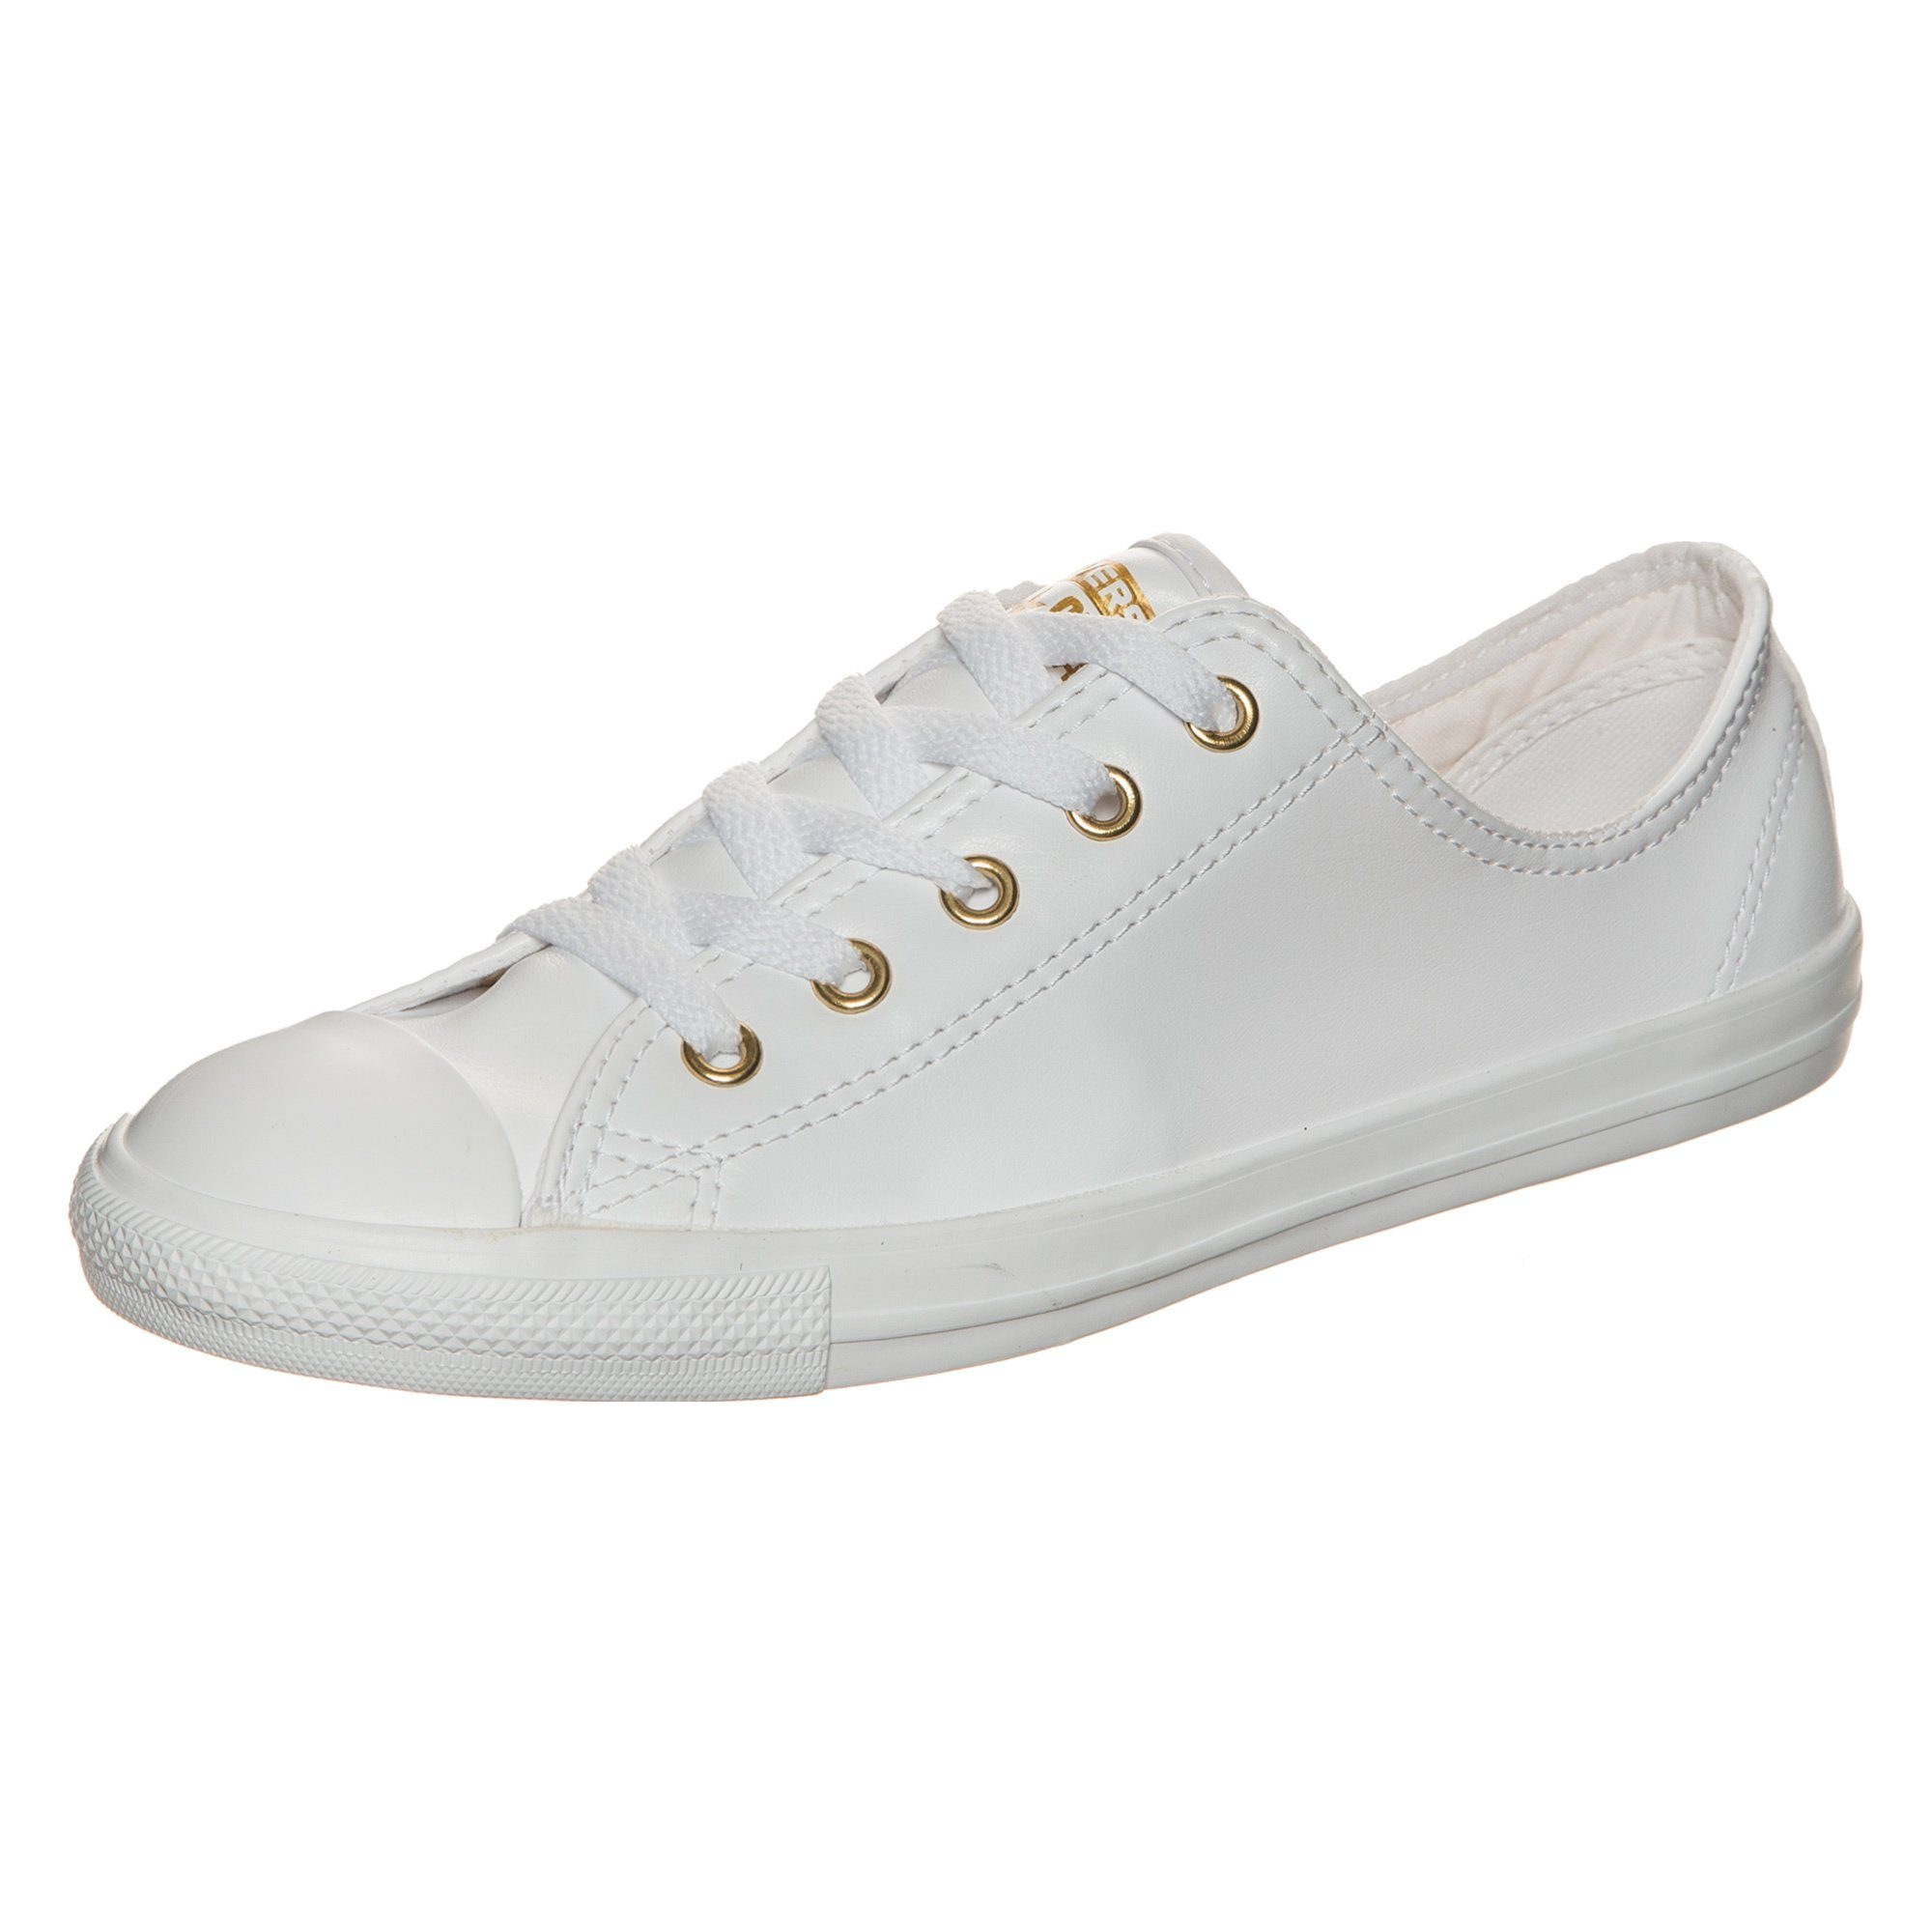 Converse Chuck Taylor All Star Dainty OX Sneaker Damen online kaufen | BAUR